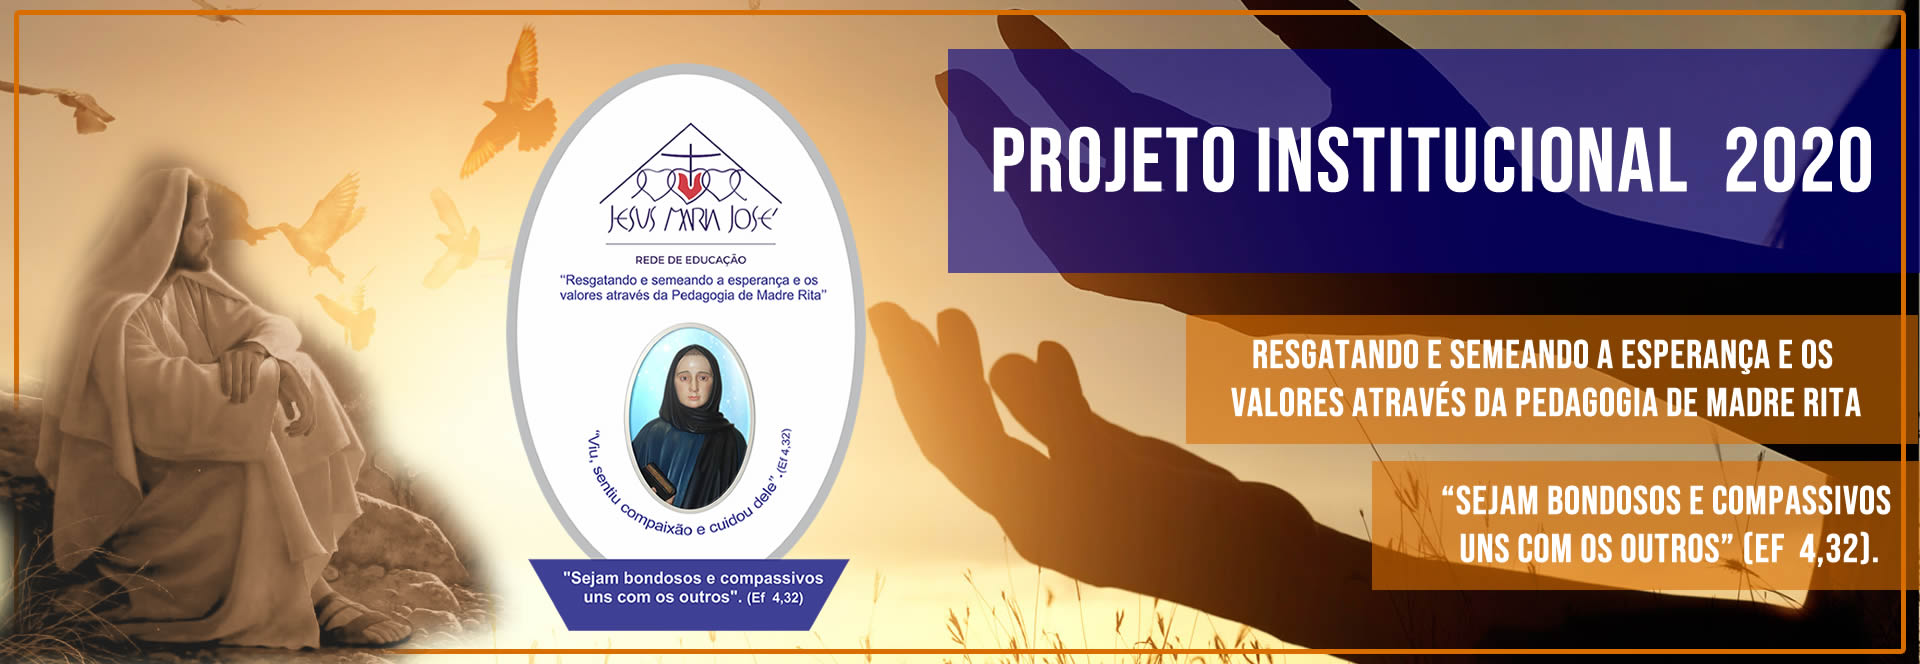 Banner Projeto